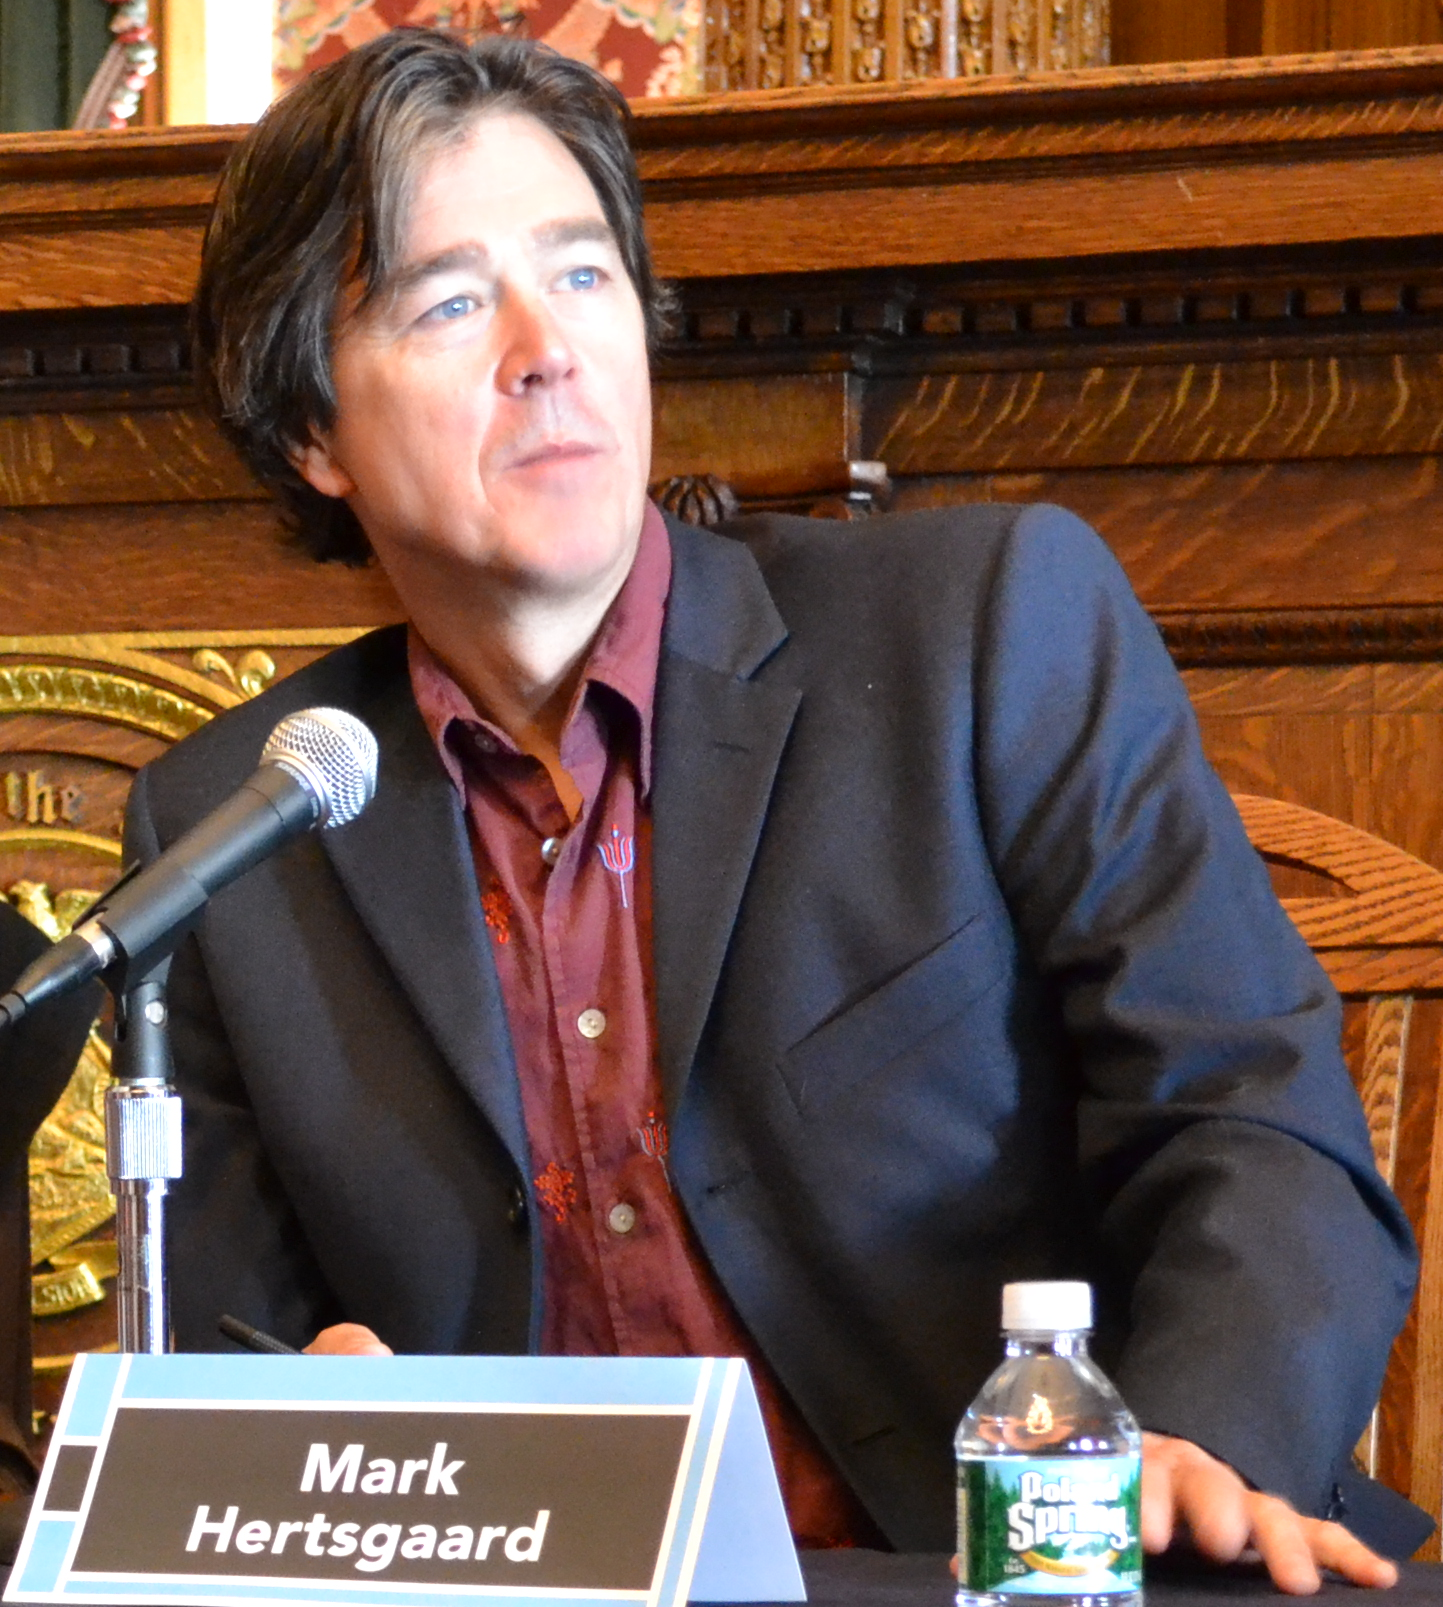 Mark Hertsgaard at the 2011 [[Brooklyn Book Festival